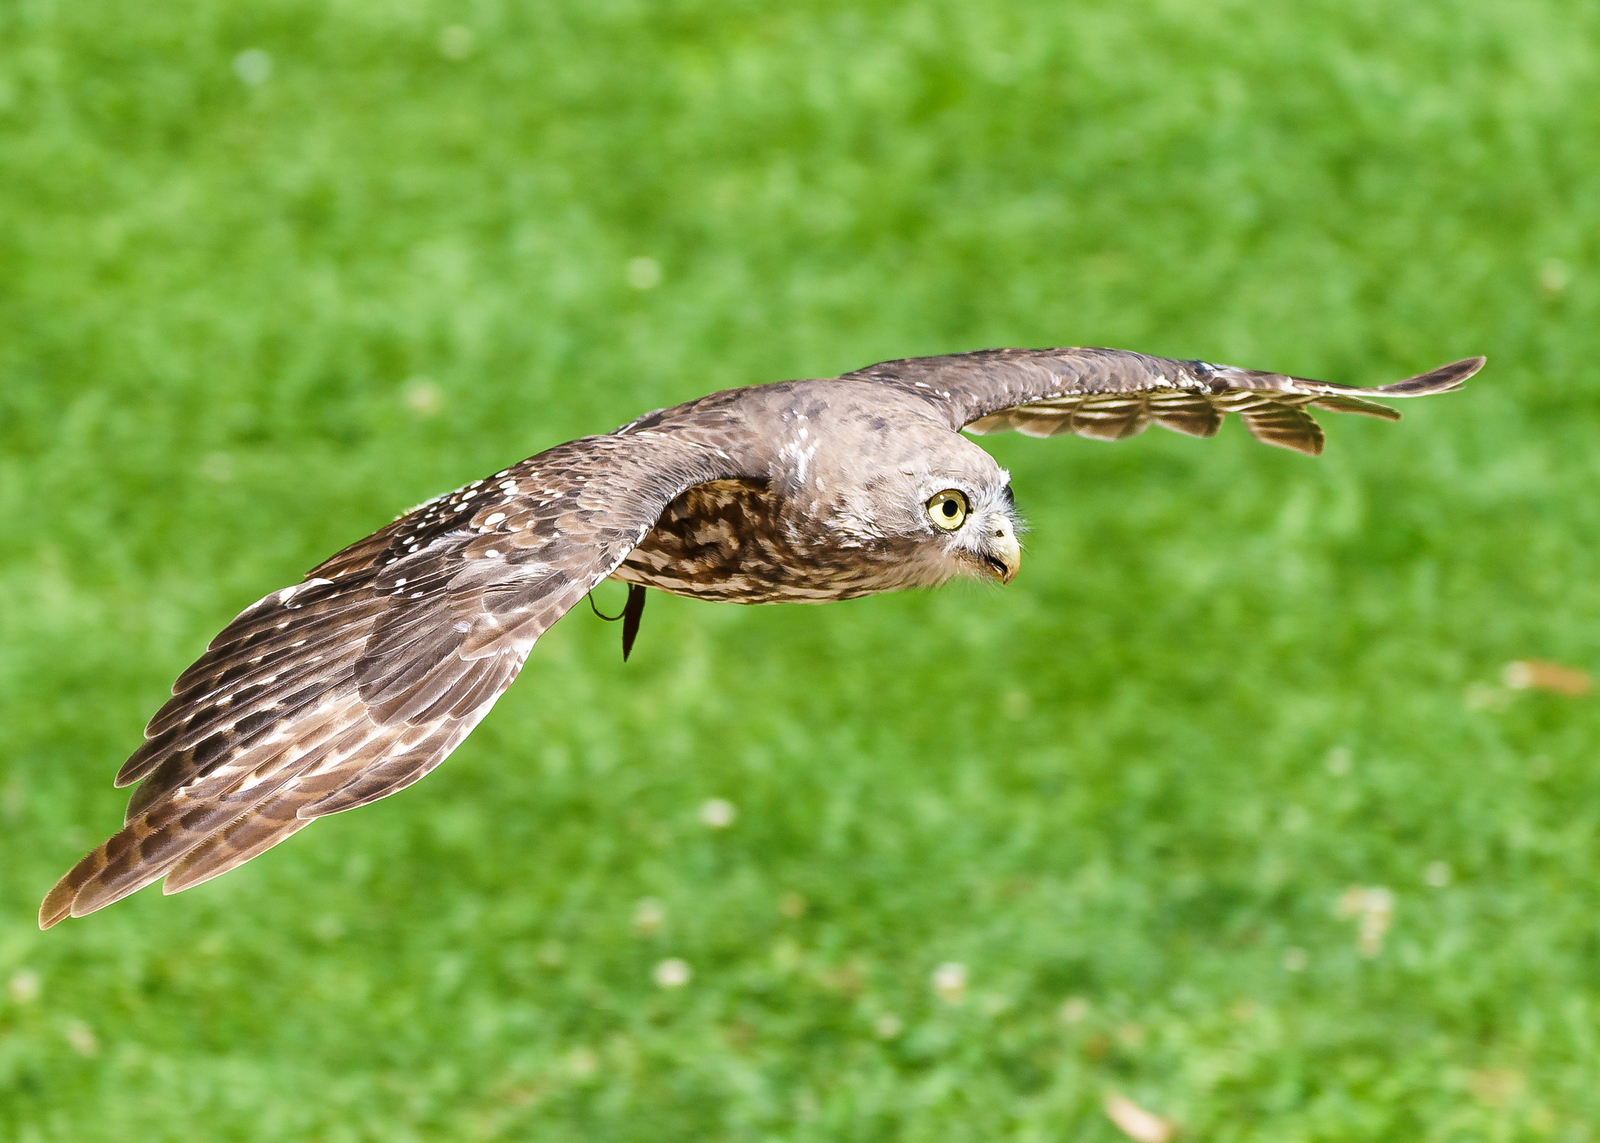 The Powerful Owl